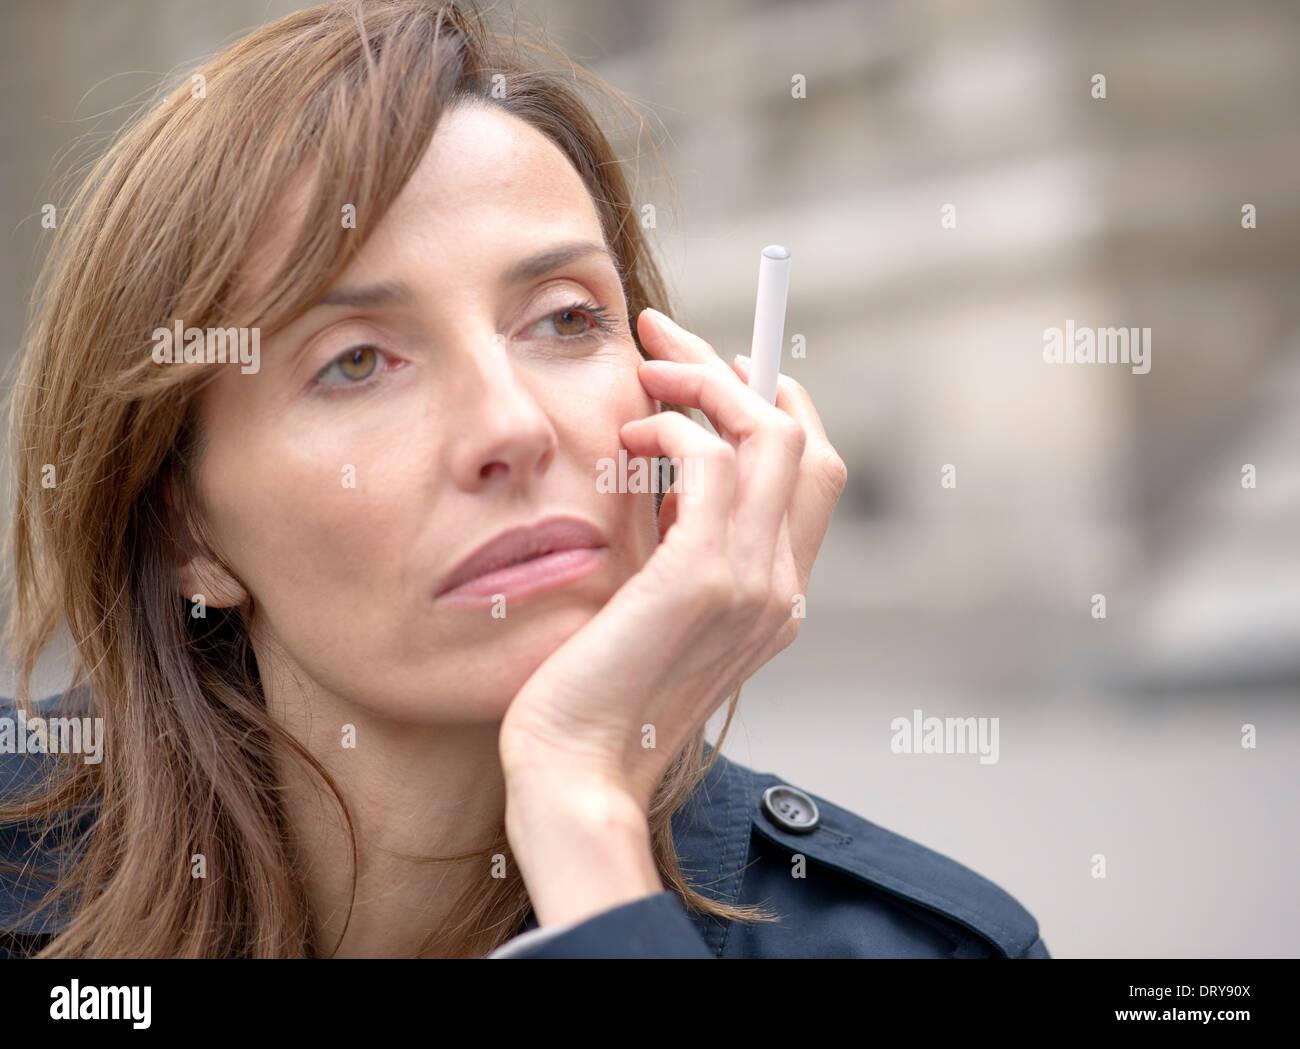 Frau rauchen elektronische Zigarette im freien Stockbild